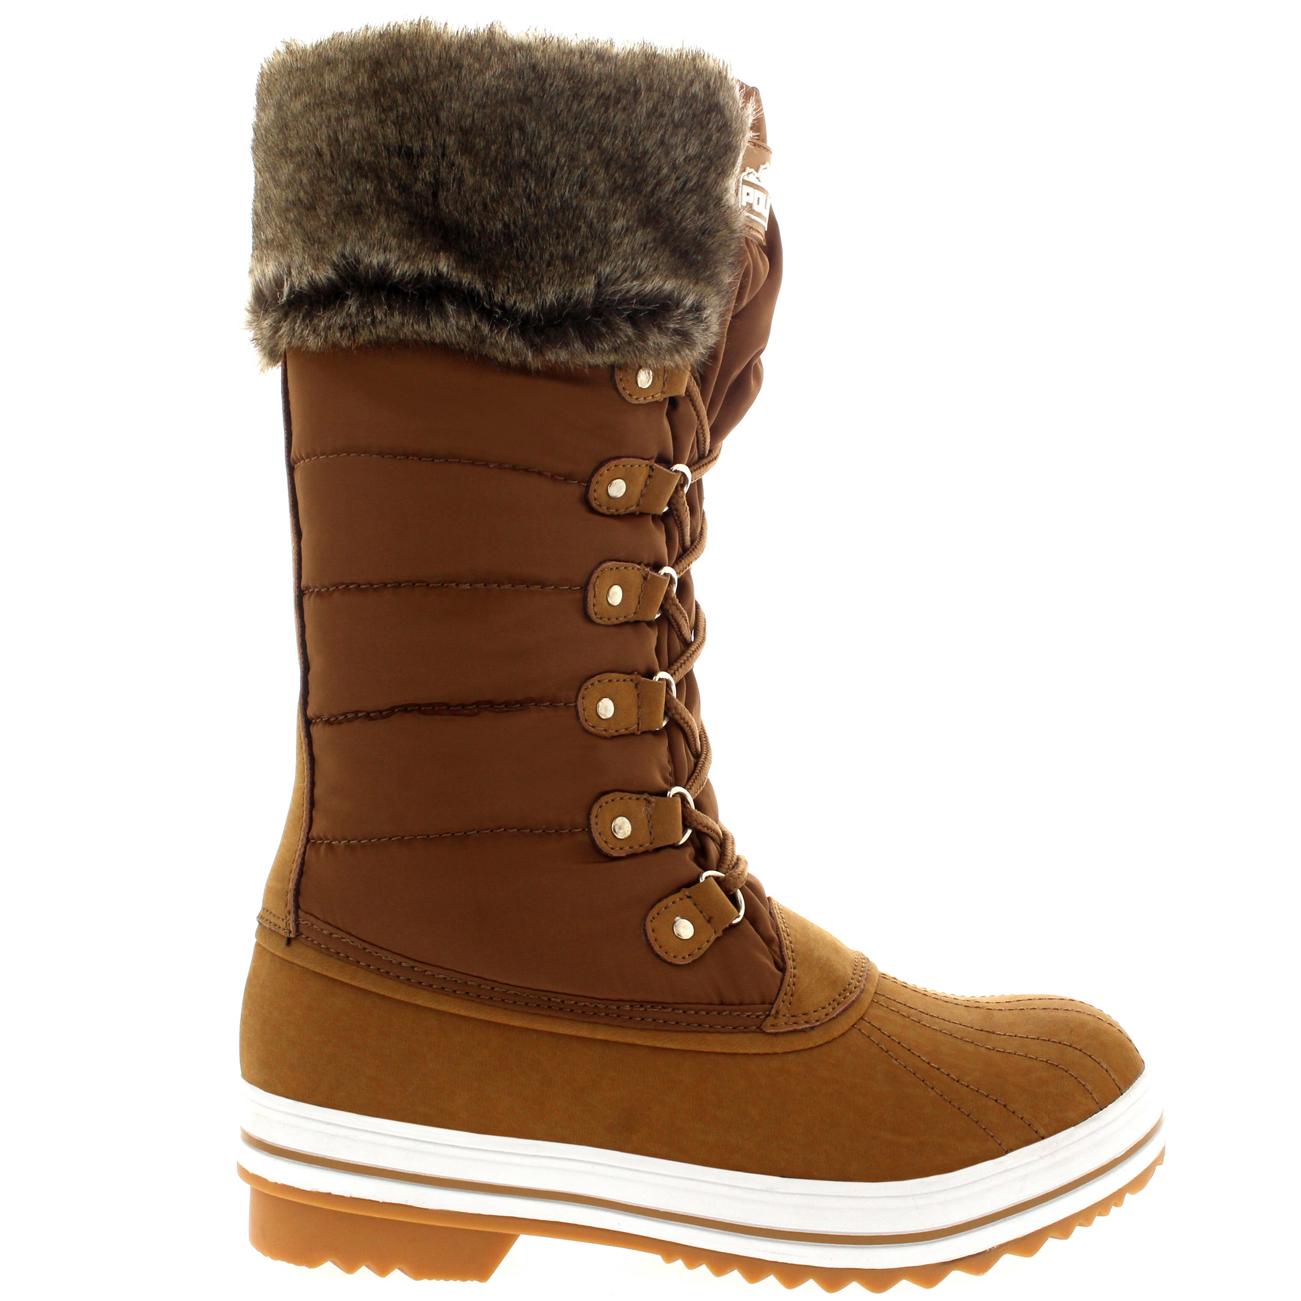 Muck Snow Boots | Homewood Mountain Ski Resort